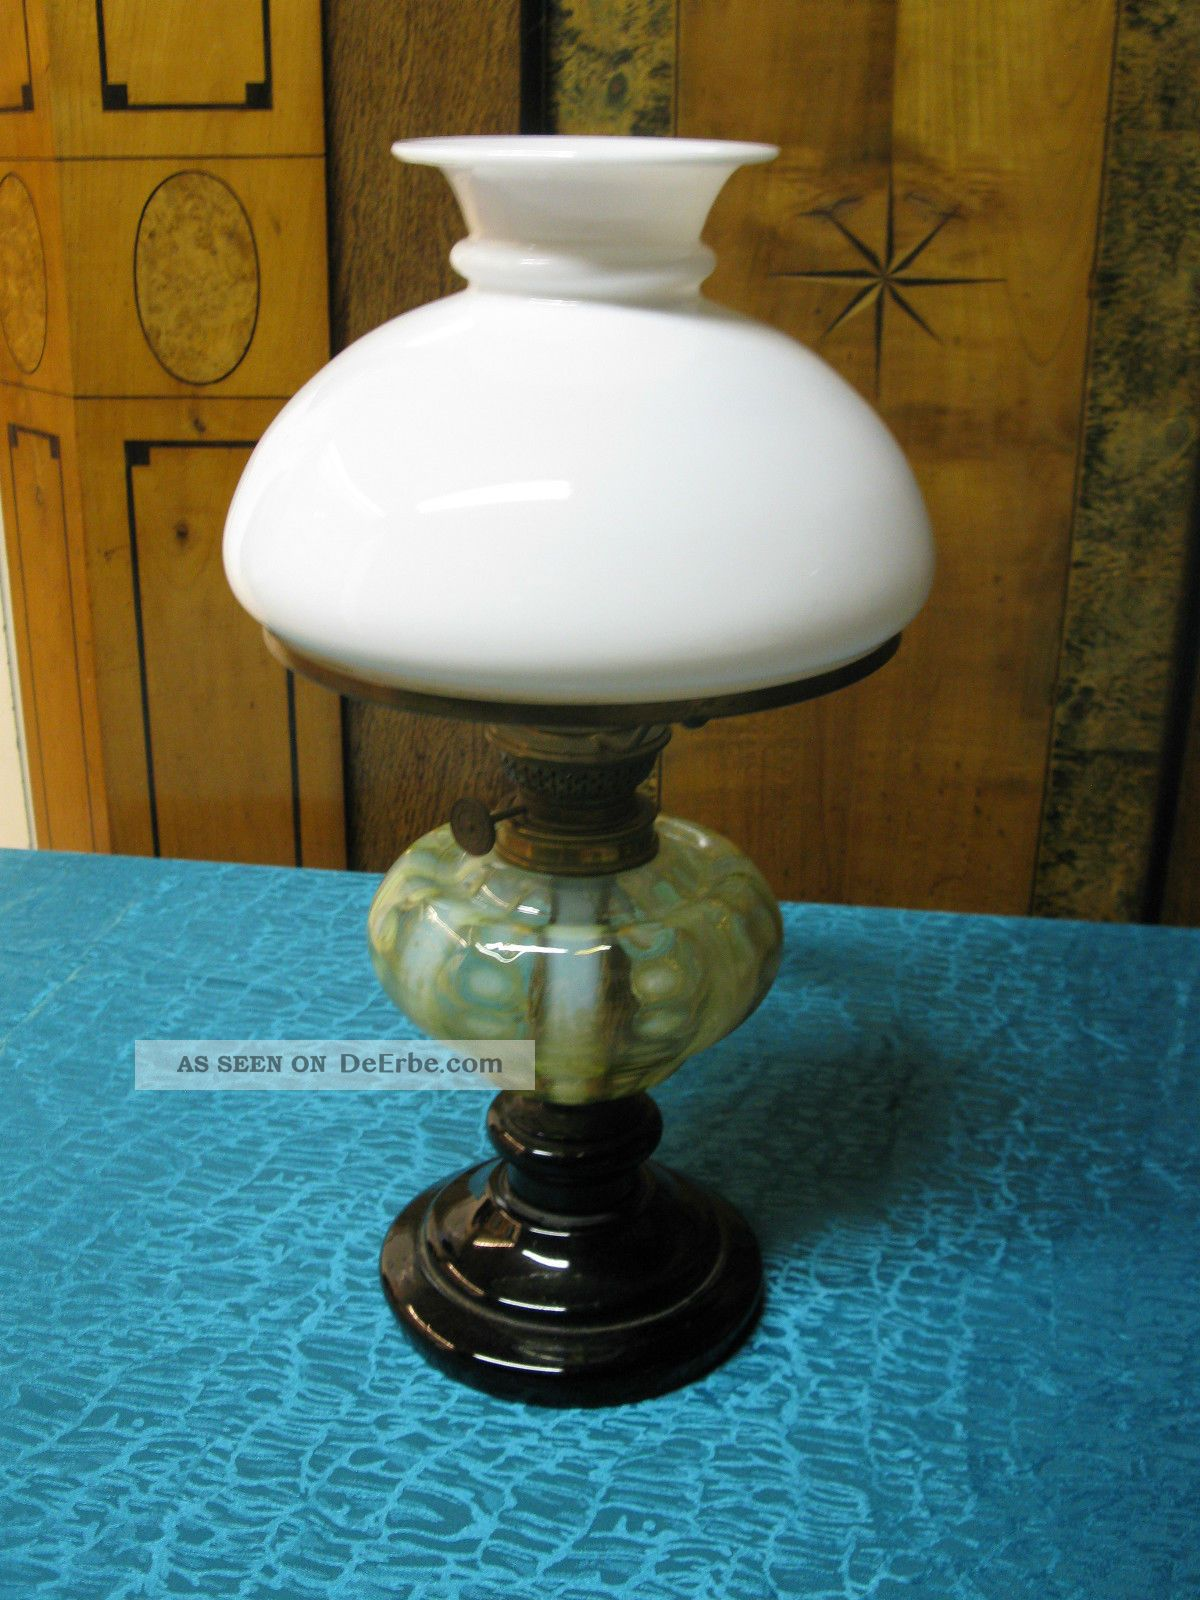 uralte antike petroleumlampe glas mit abriss in guter sammelwerter erhaltung. Black Bedroom Furniture Sets. Home Design Ideas